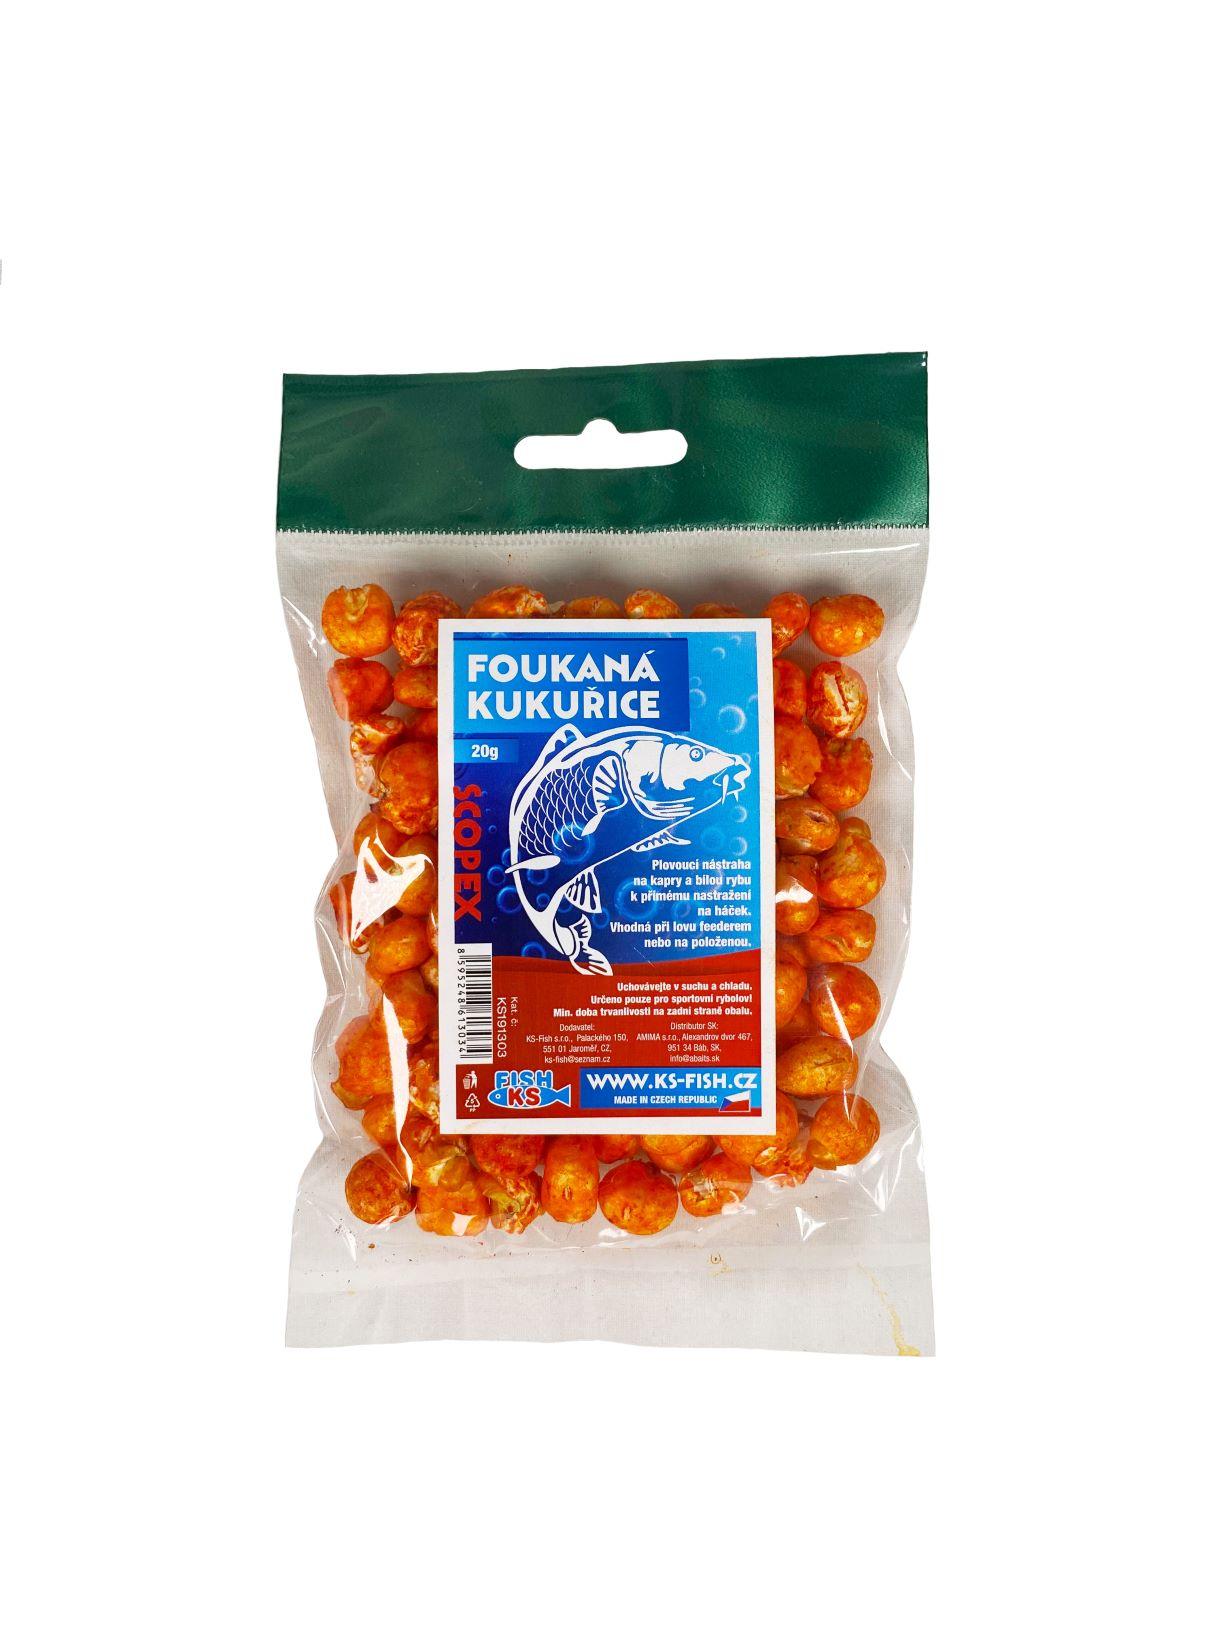 KS Fish foukaná kukuřice 20g, scoopex